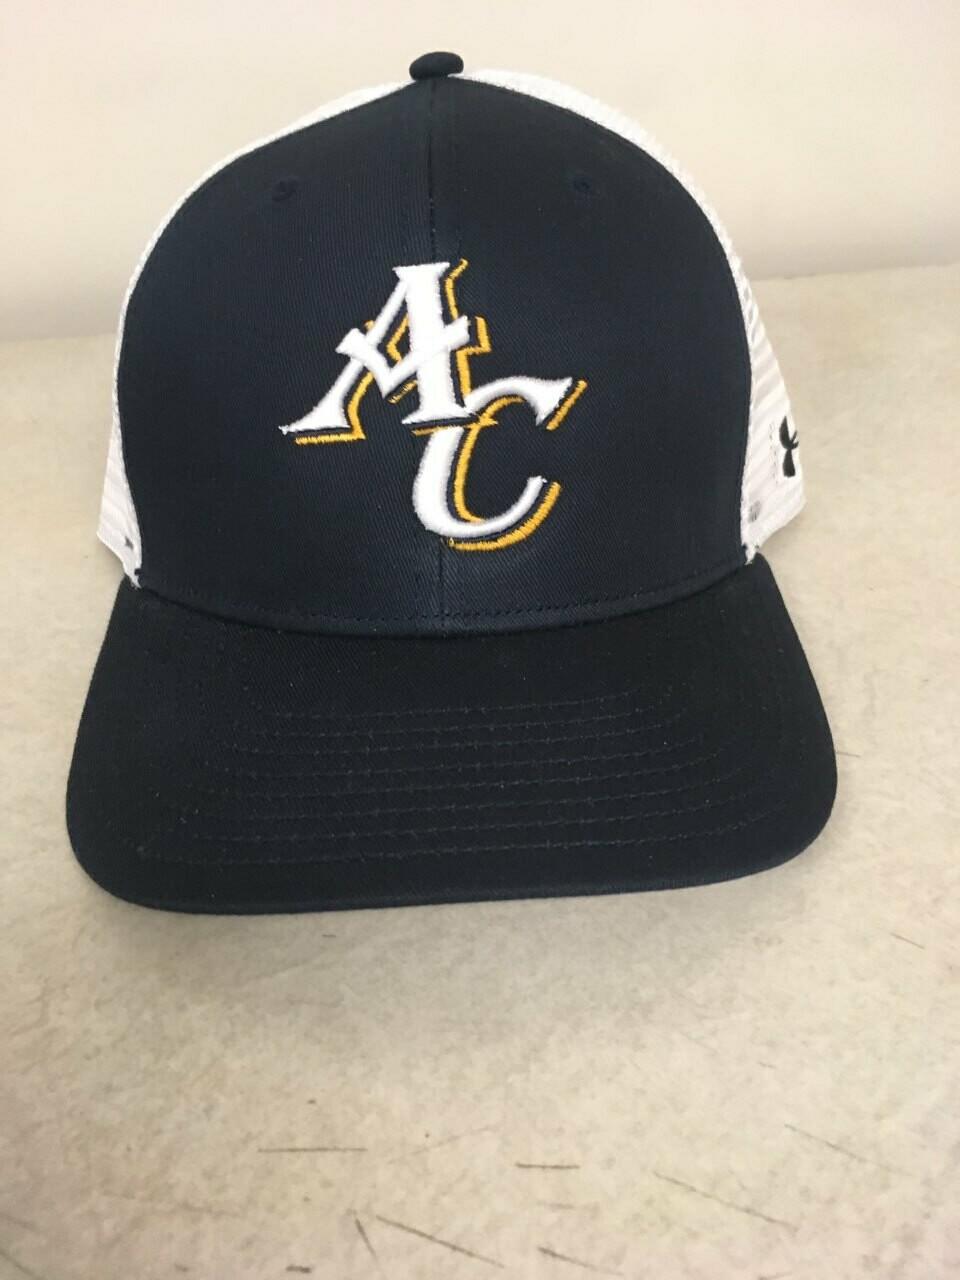 Navy Blue and White Mesh Baseball Hat